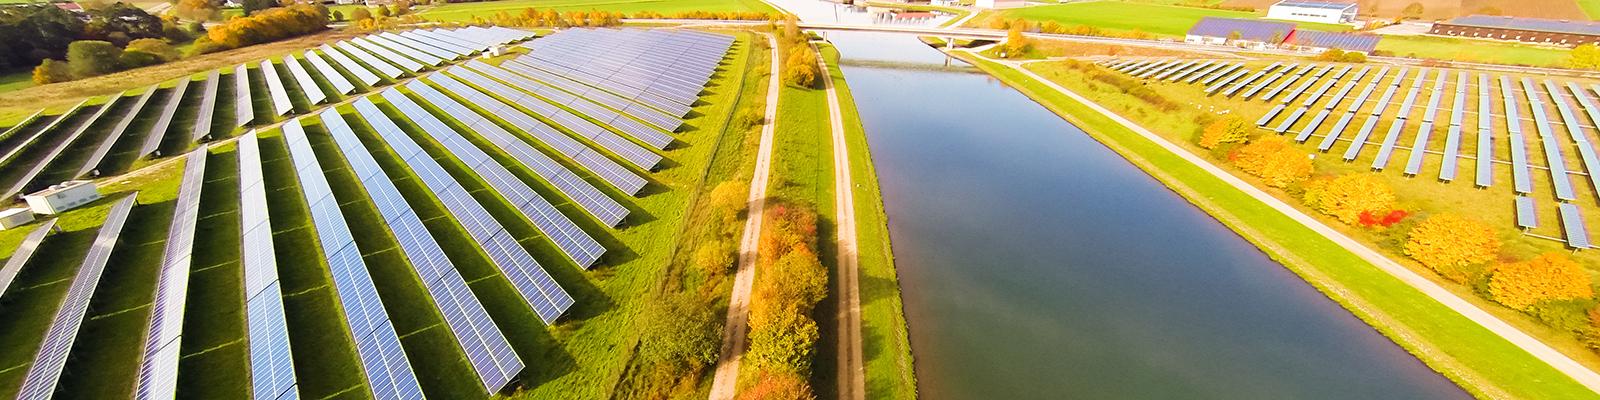 Solaranlage zum Thema Erneuerbare Energien; Quelle: iStock.com/nullplus